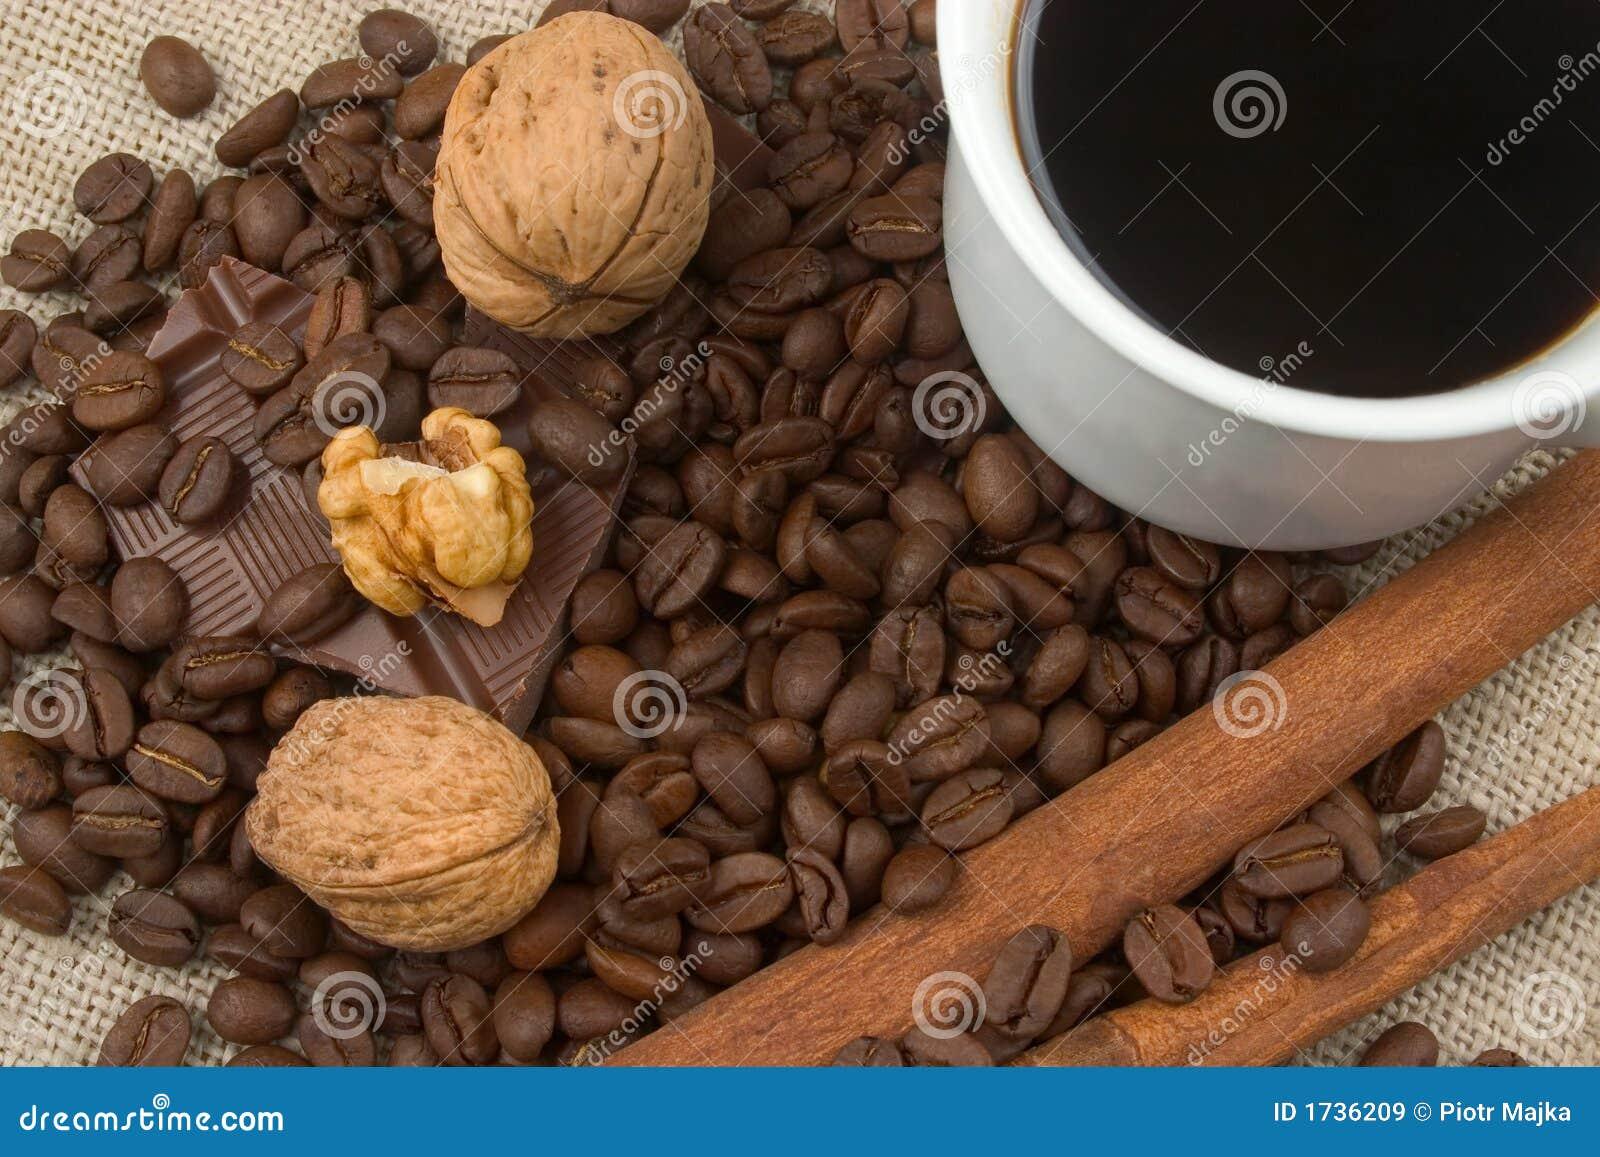 Walnuts, Coffee Beans,chocolate And Cinnamon Royalty Free ...